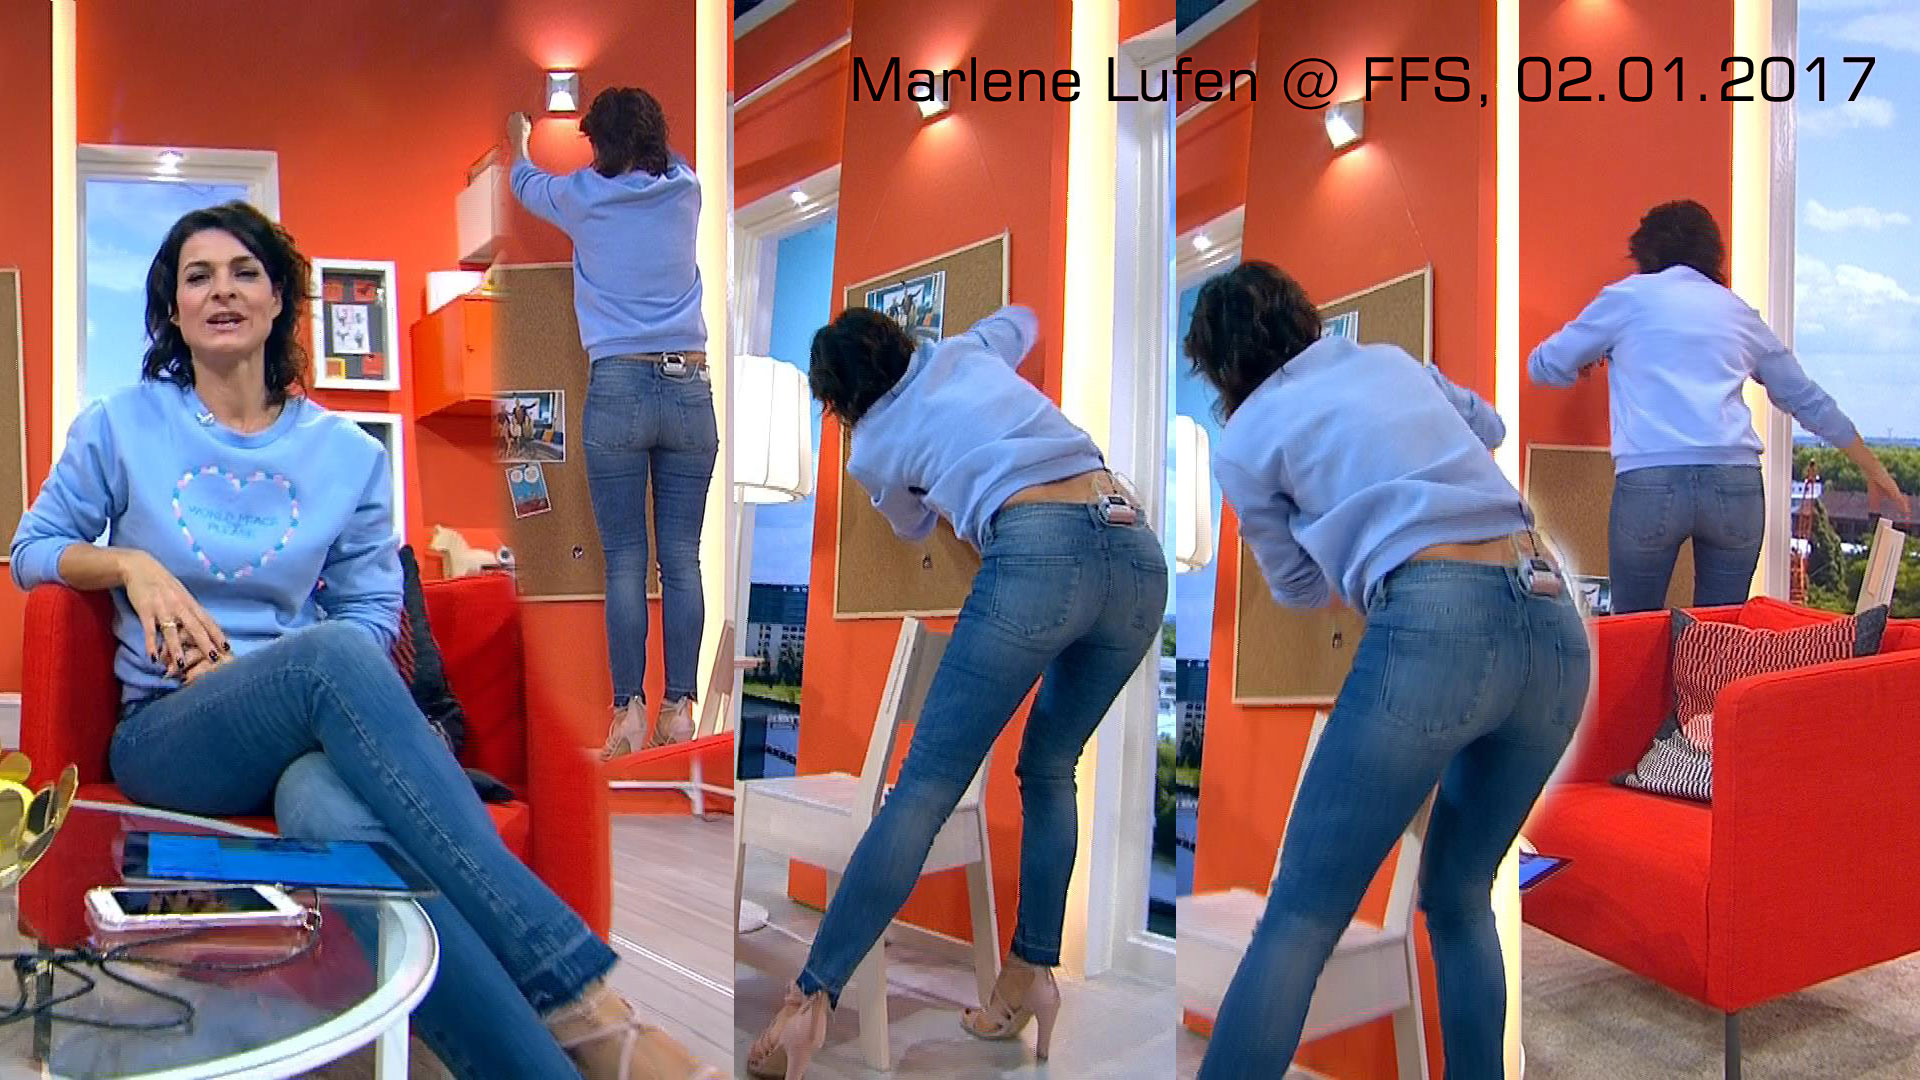 Marlene_Lufen_-_Jeans-Arsch_Butt_FFS_02.01.2017.jpg